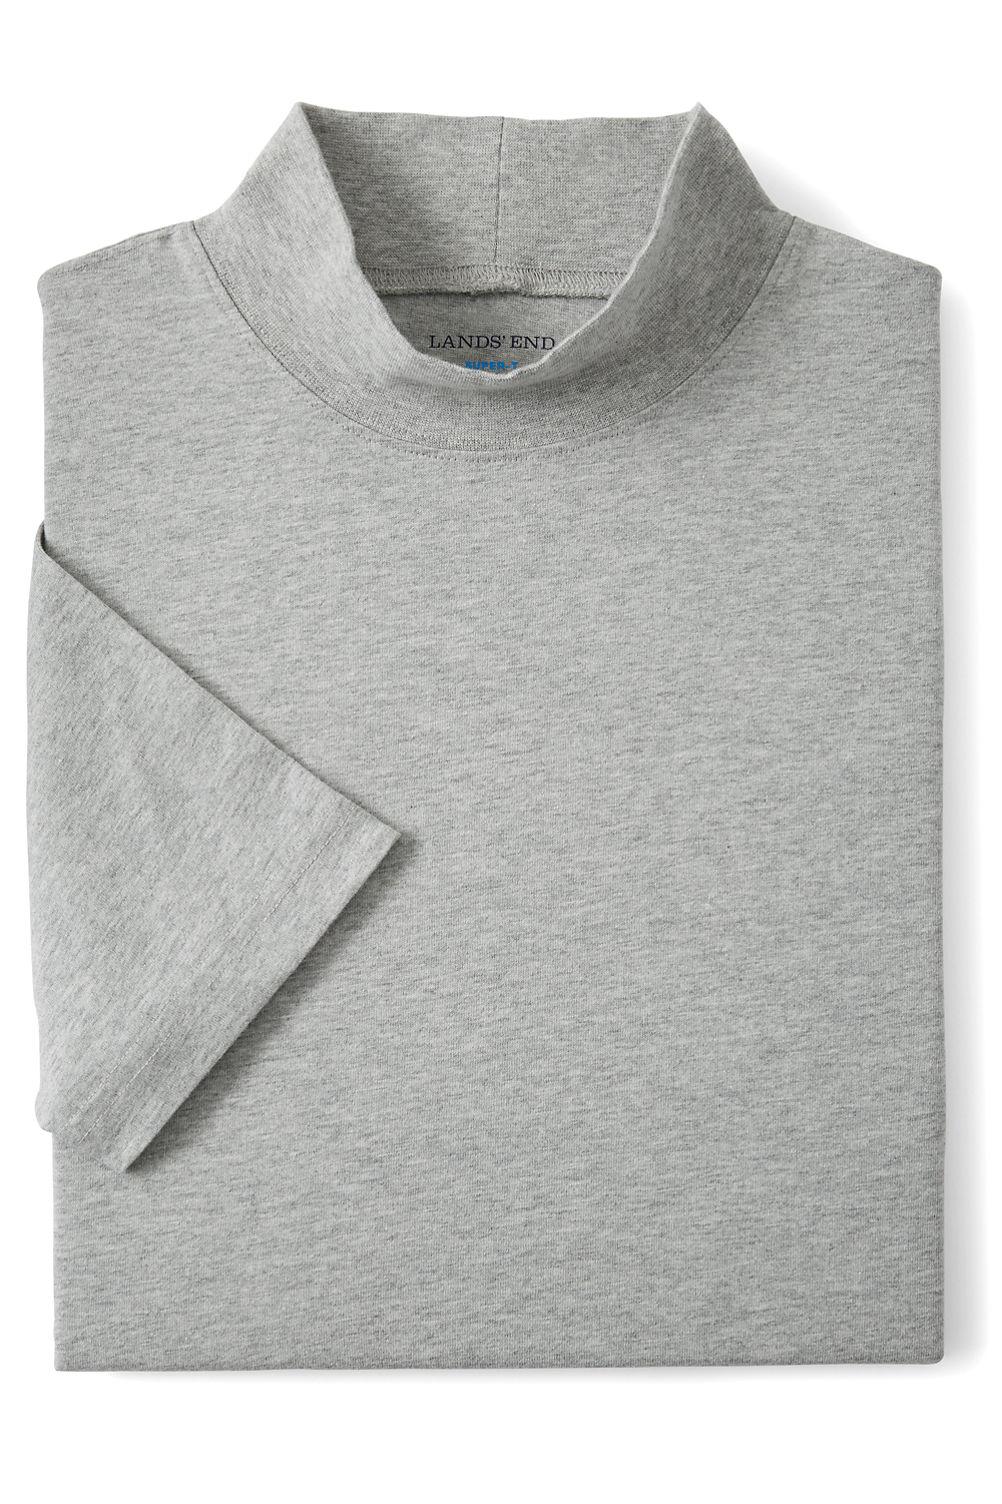 2563be35a4f8c7 Sleeveless Golf Shirts Plus Size